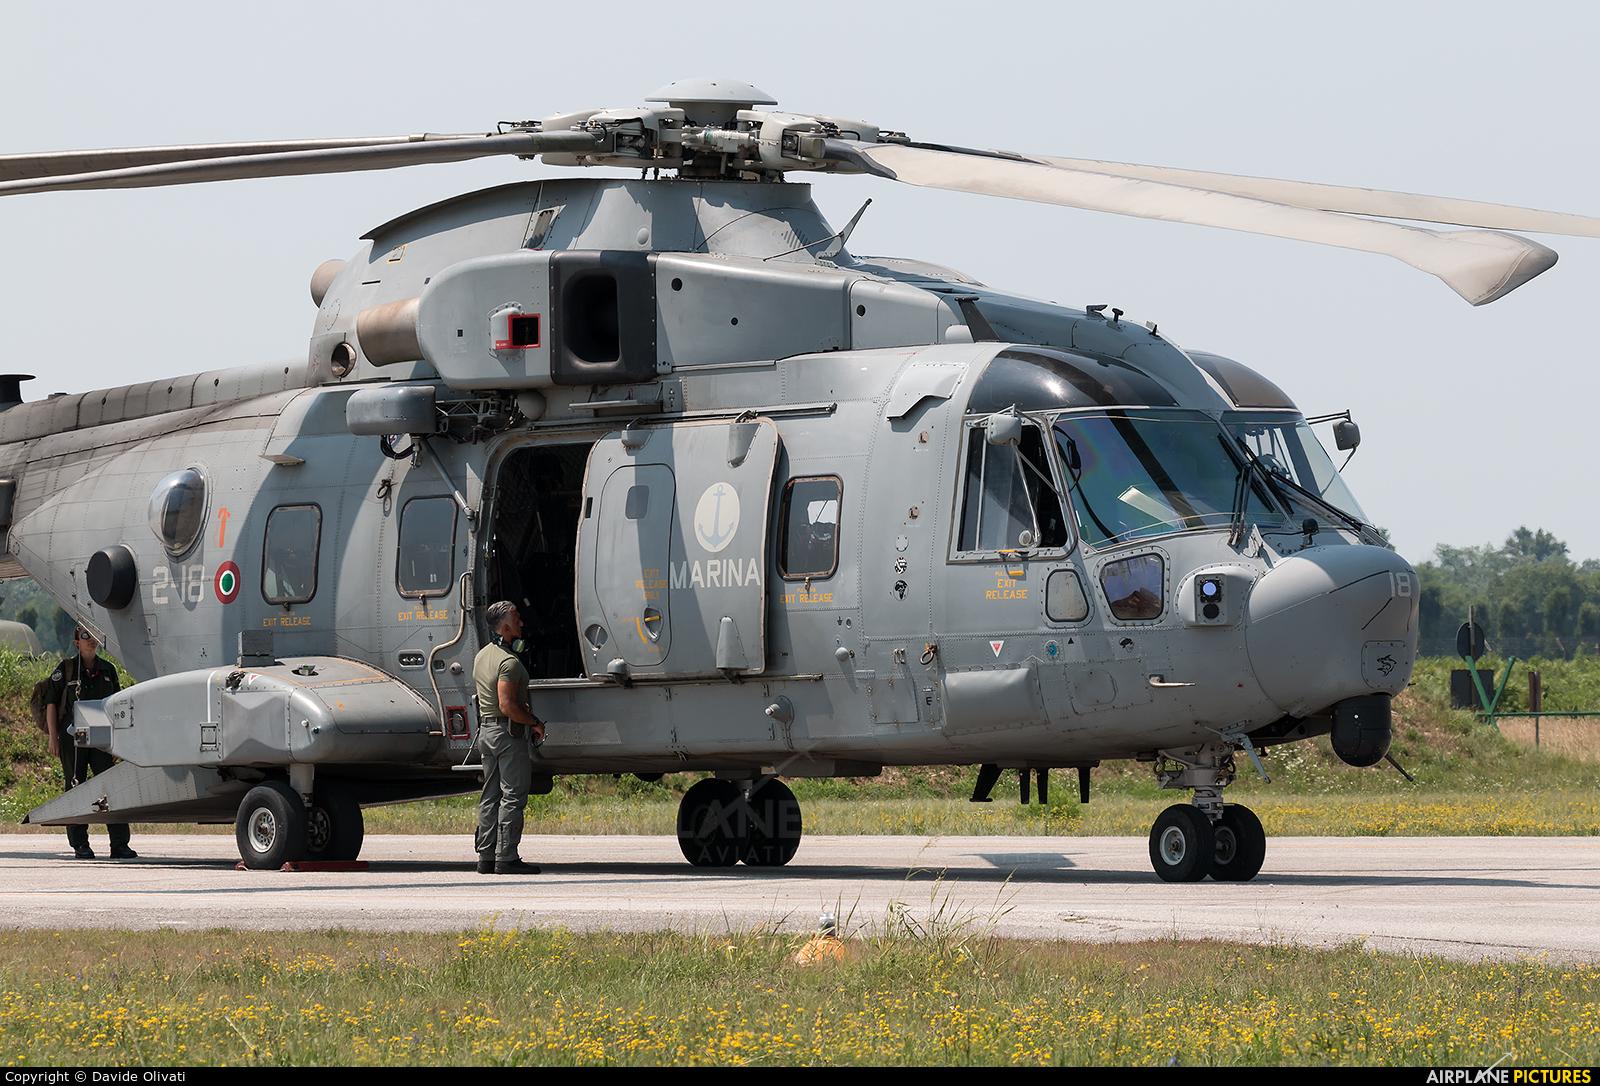 Italy - Navy MM81633 aircraft at Rivolto